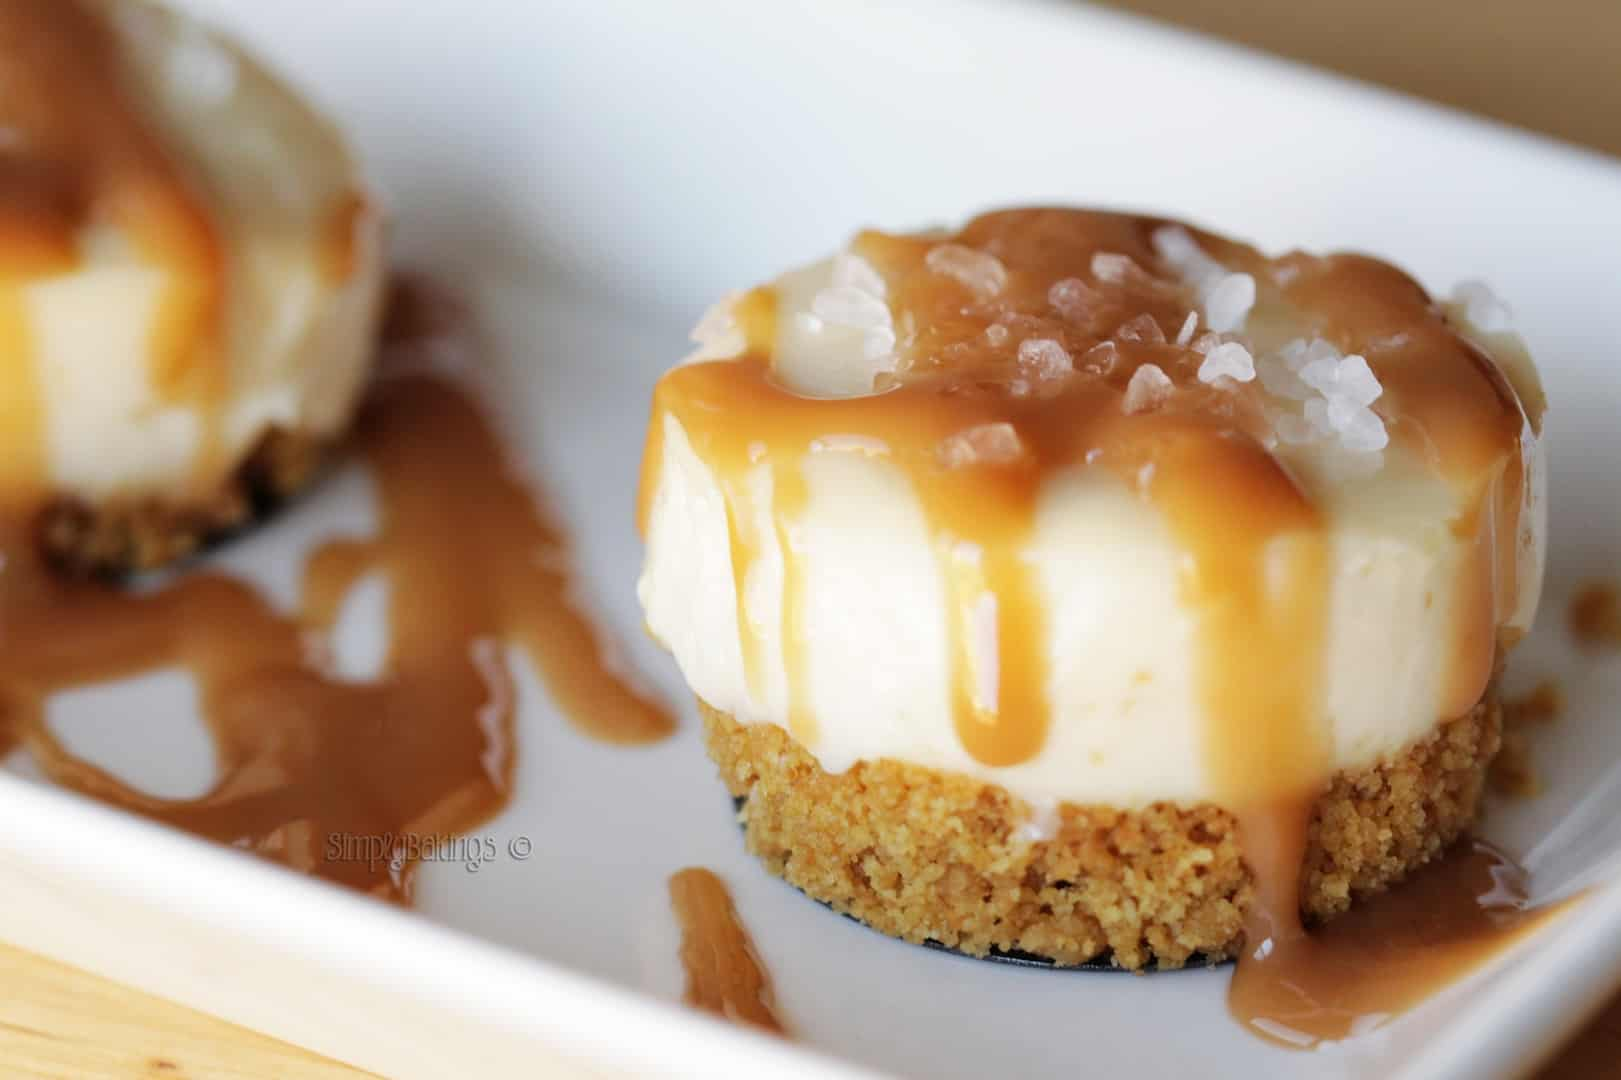 Mini Salted Caramel Cheesecake Simply Bakings